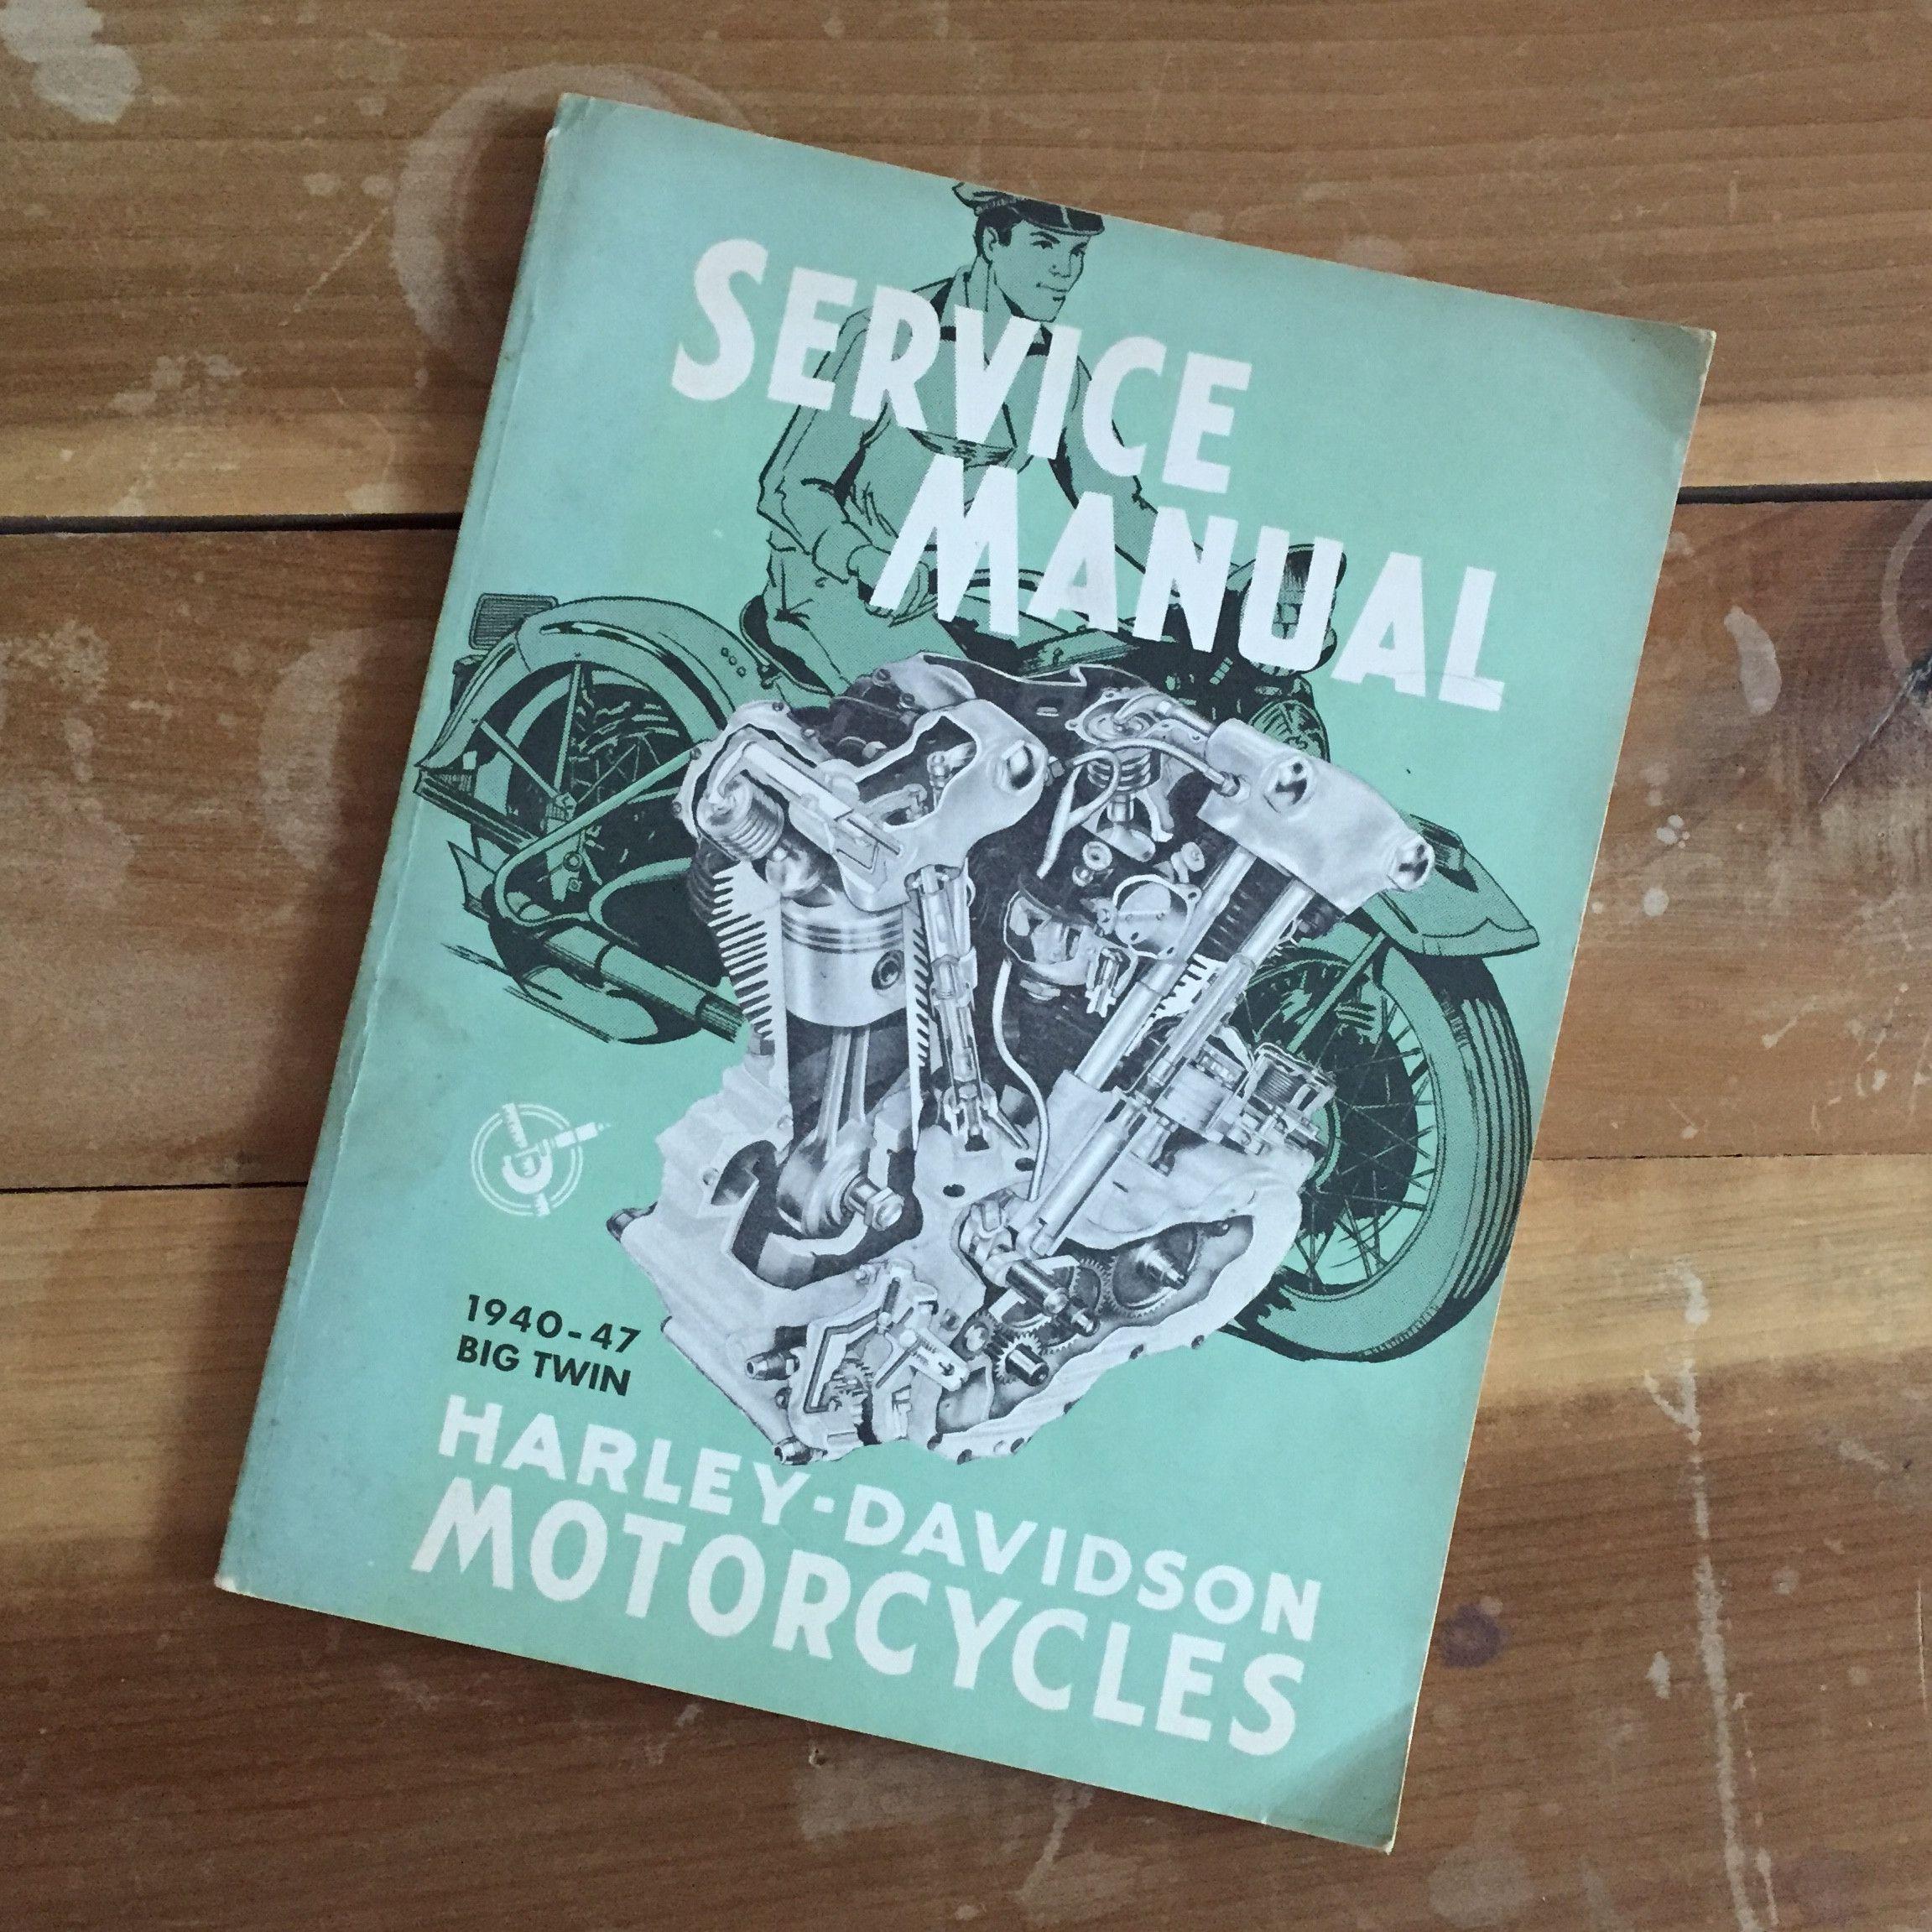 A TSY VINTAGE GOODS, 1940-1947 BIG TWIN HARLEY-DAVIDSON MOTORCYCLES SERVICE  MANUAL, ORIGINAL